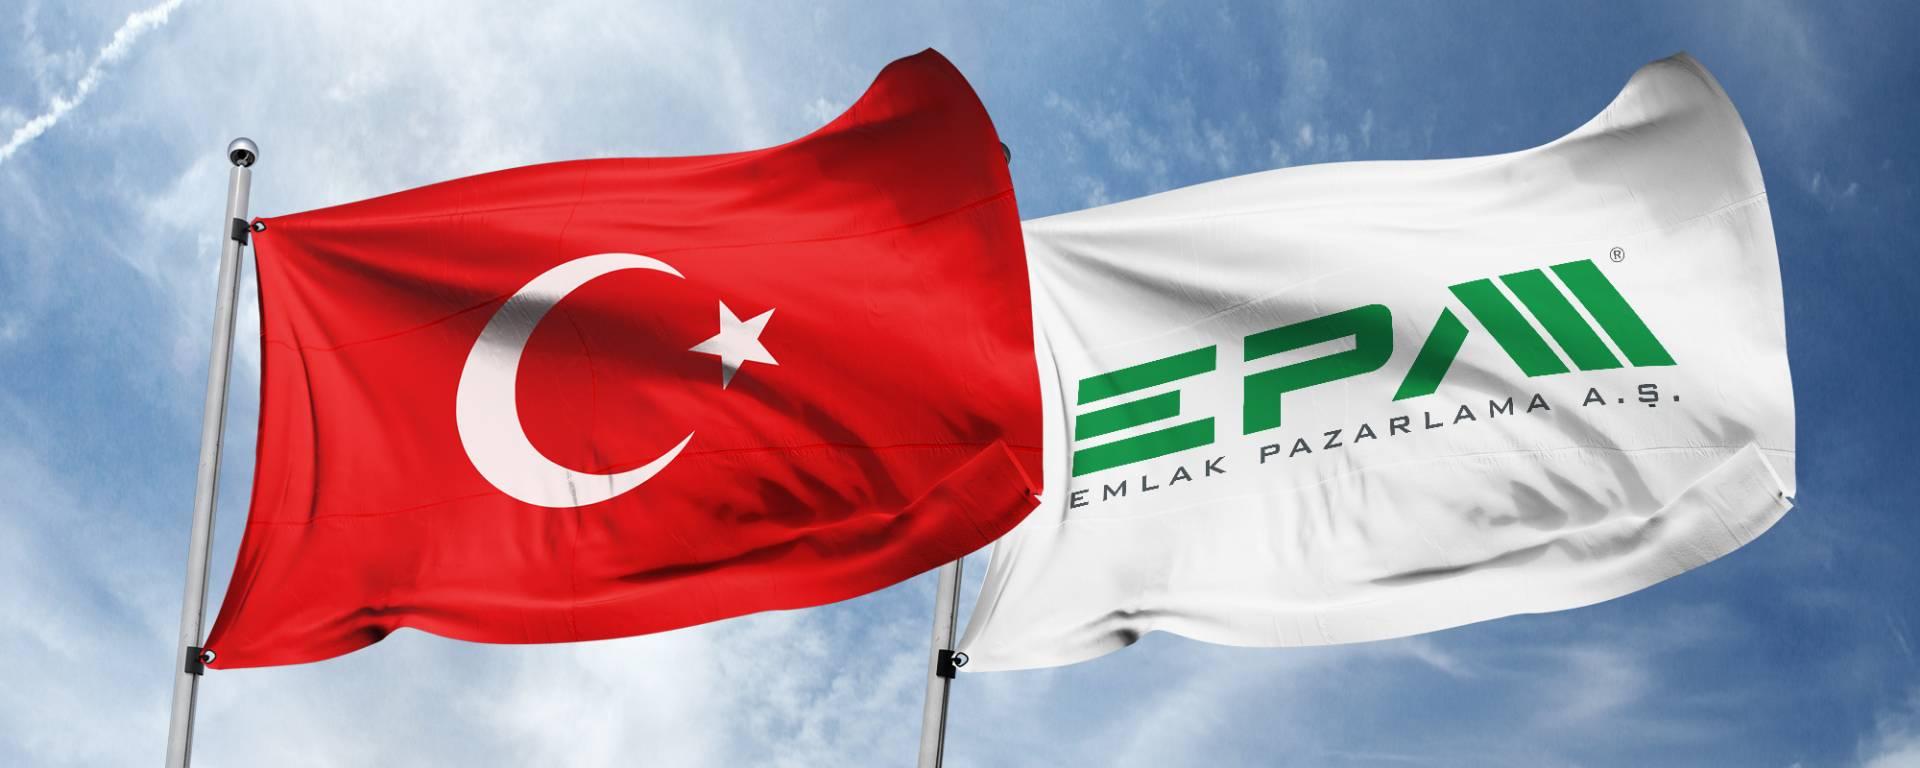 www.epaemlak.com.tr EPA EMLAK PAZARLAMA A.Ş.